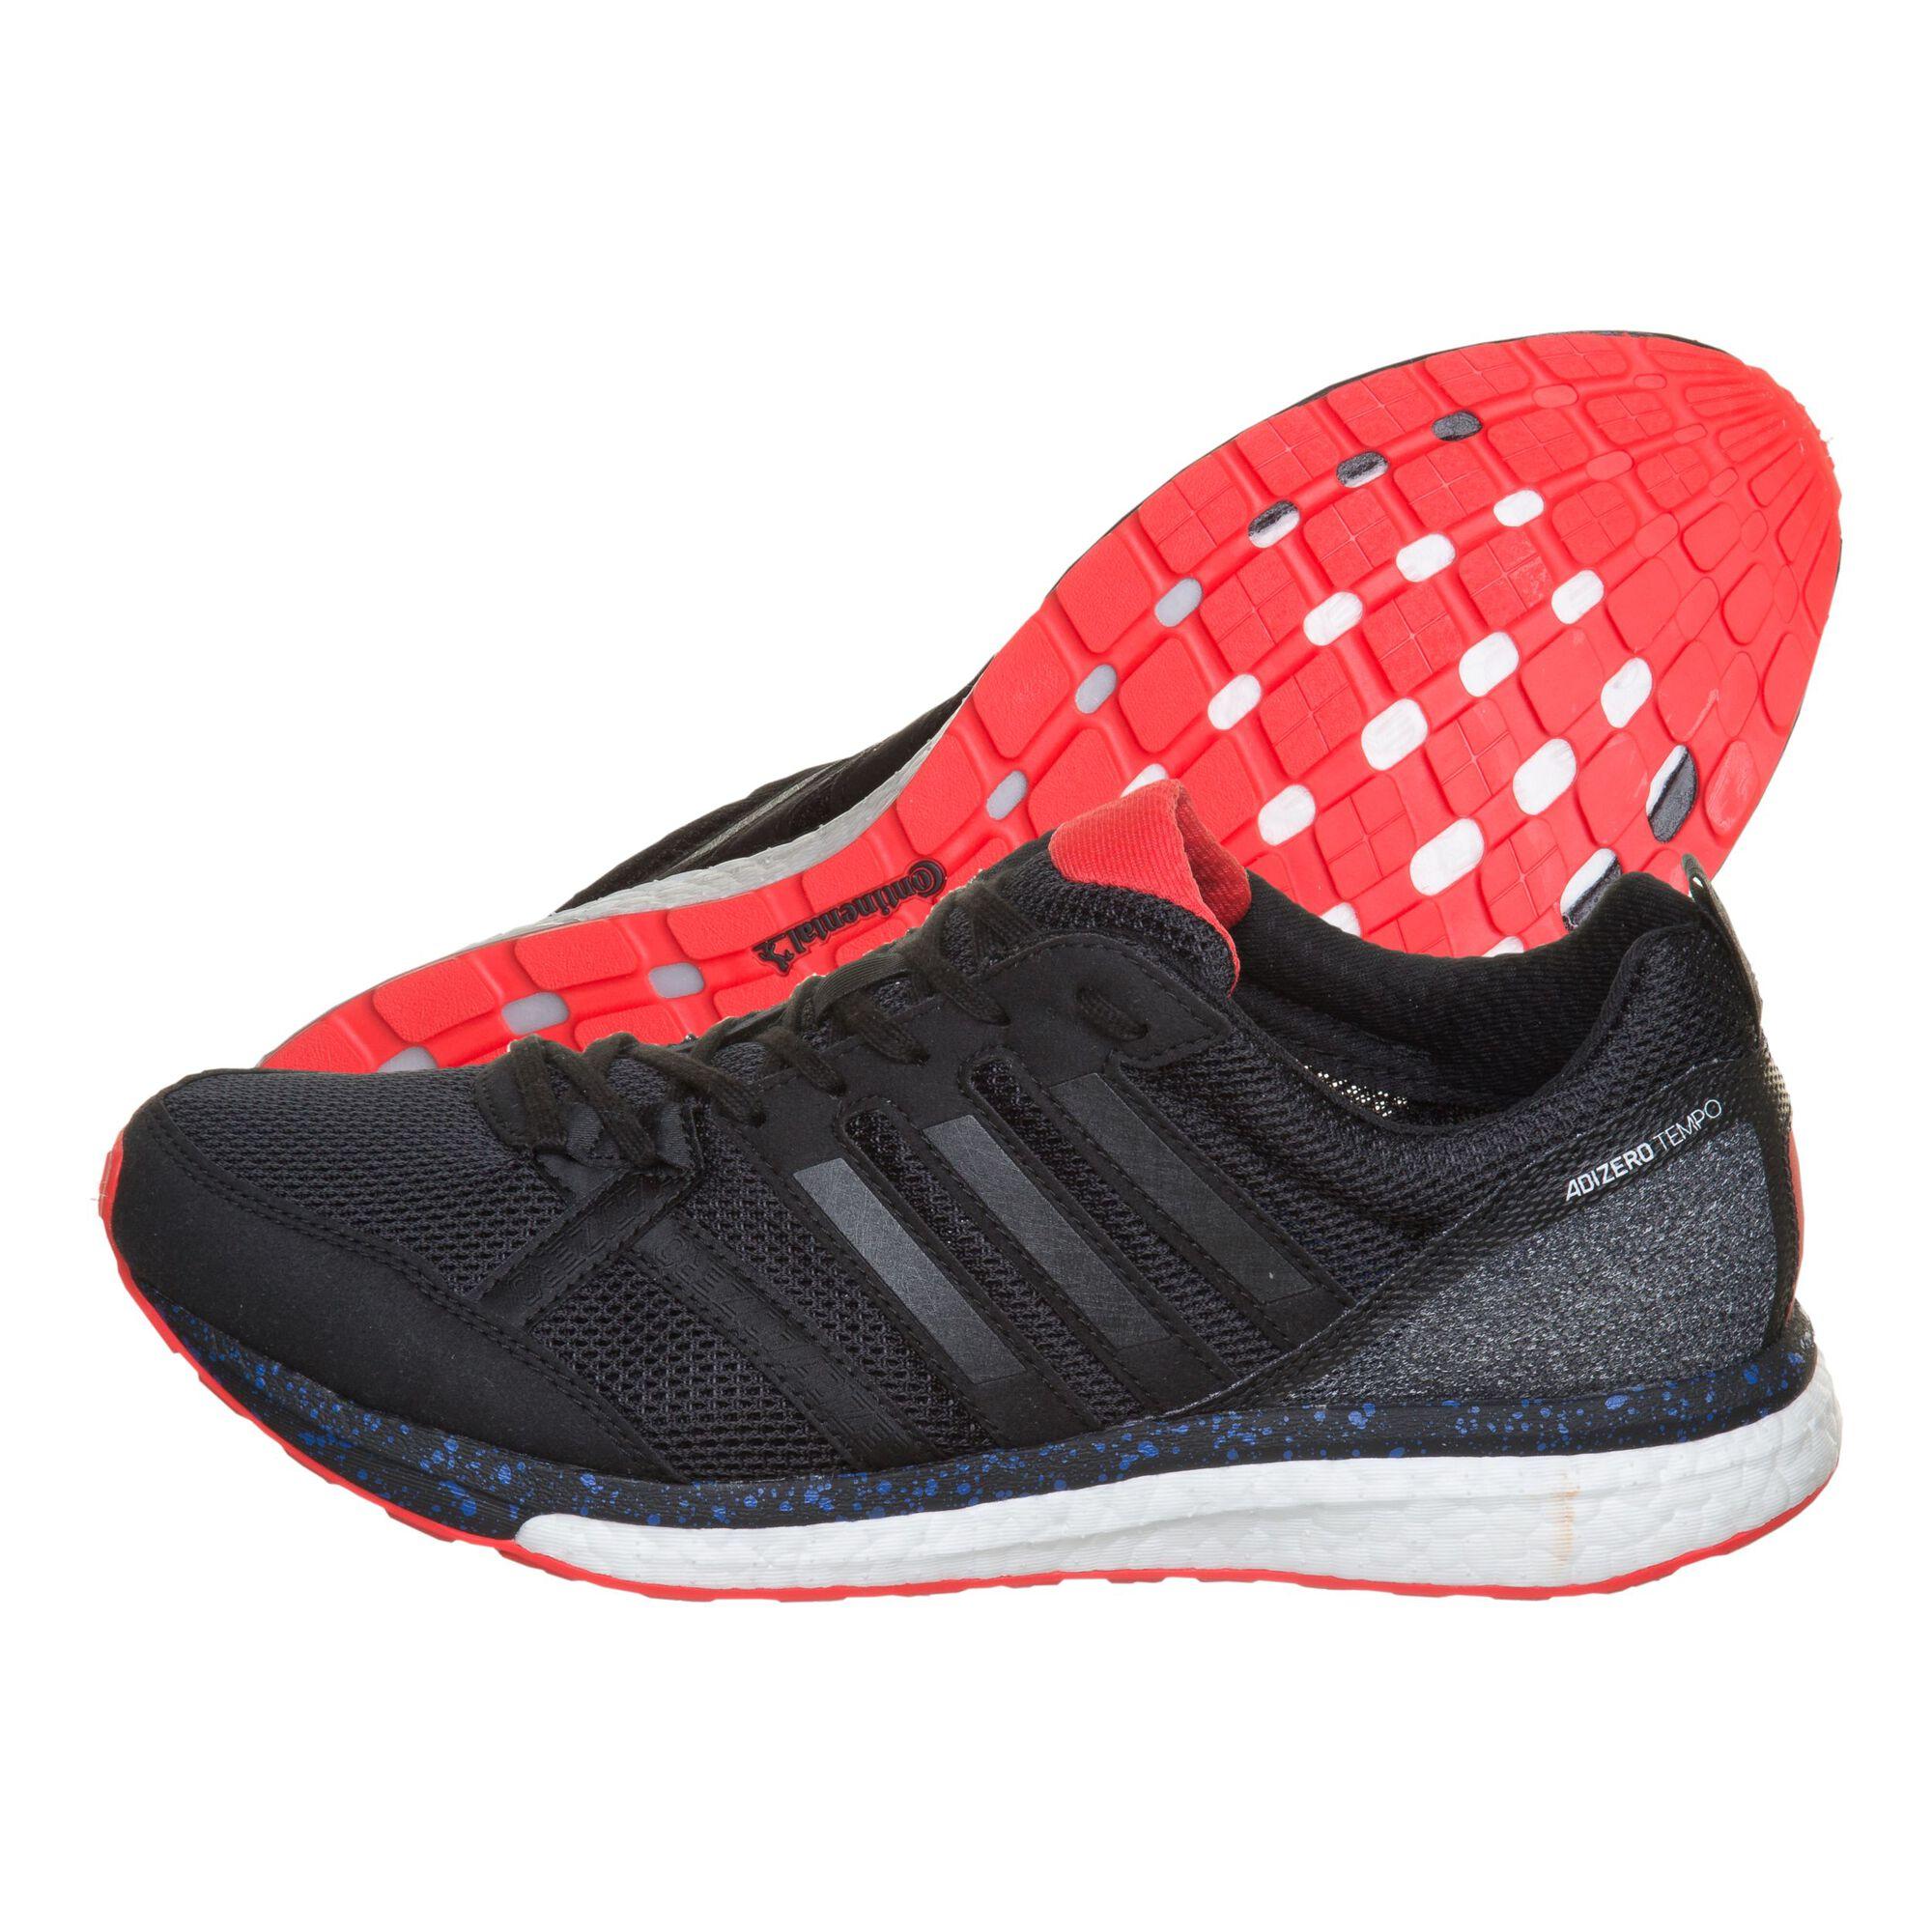 size 40 f034c 5f888 adidas · adidas · adidas · adidas · adidas · adidas · adidas · adidas ·  adidas · adidas. Adizero Tempo 9 Aktiv ...